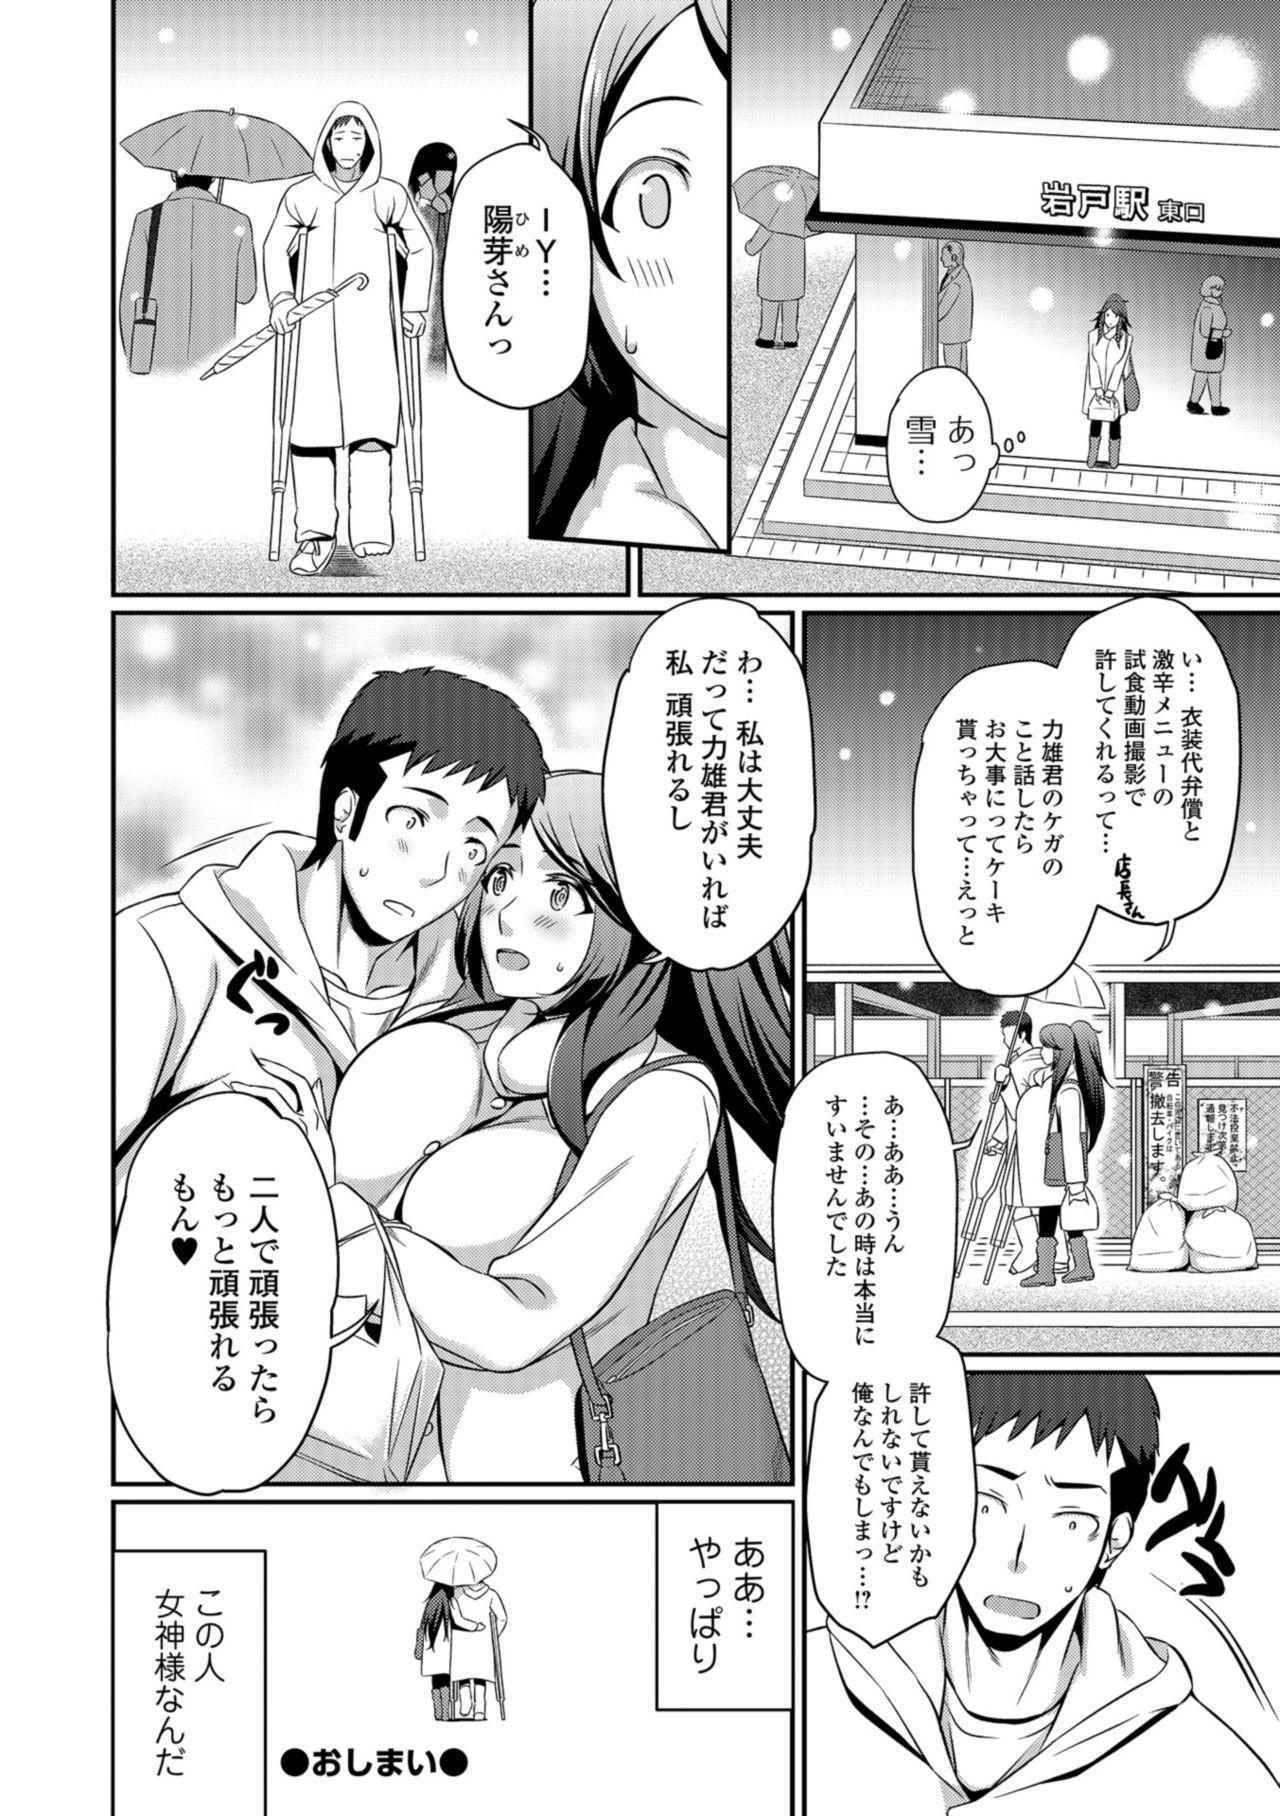 COMIC Shigekiteki SQUIRT!! Vol. 09 233